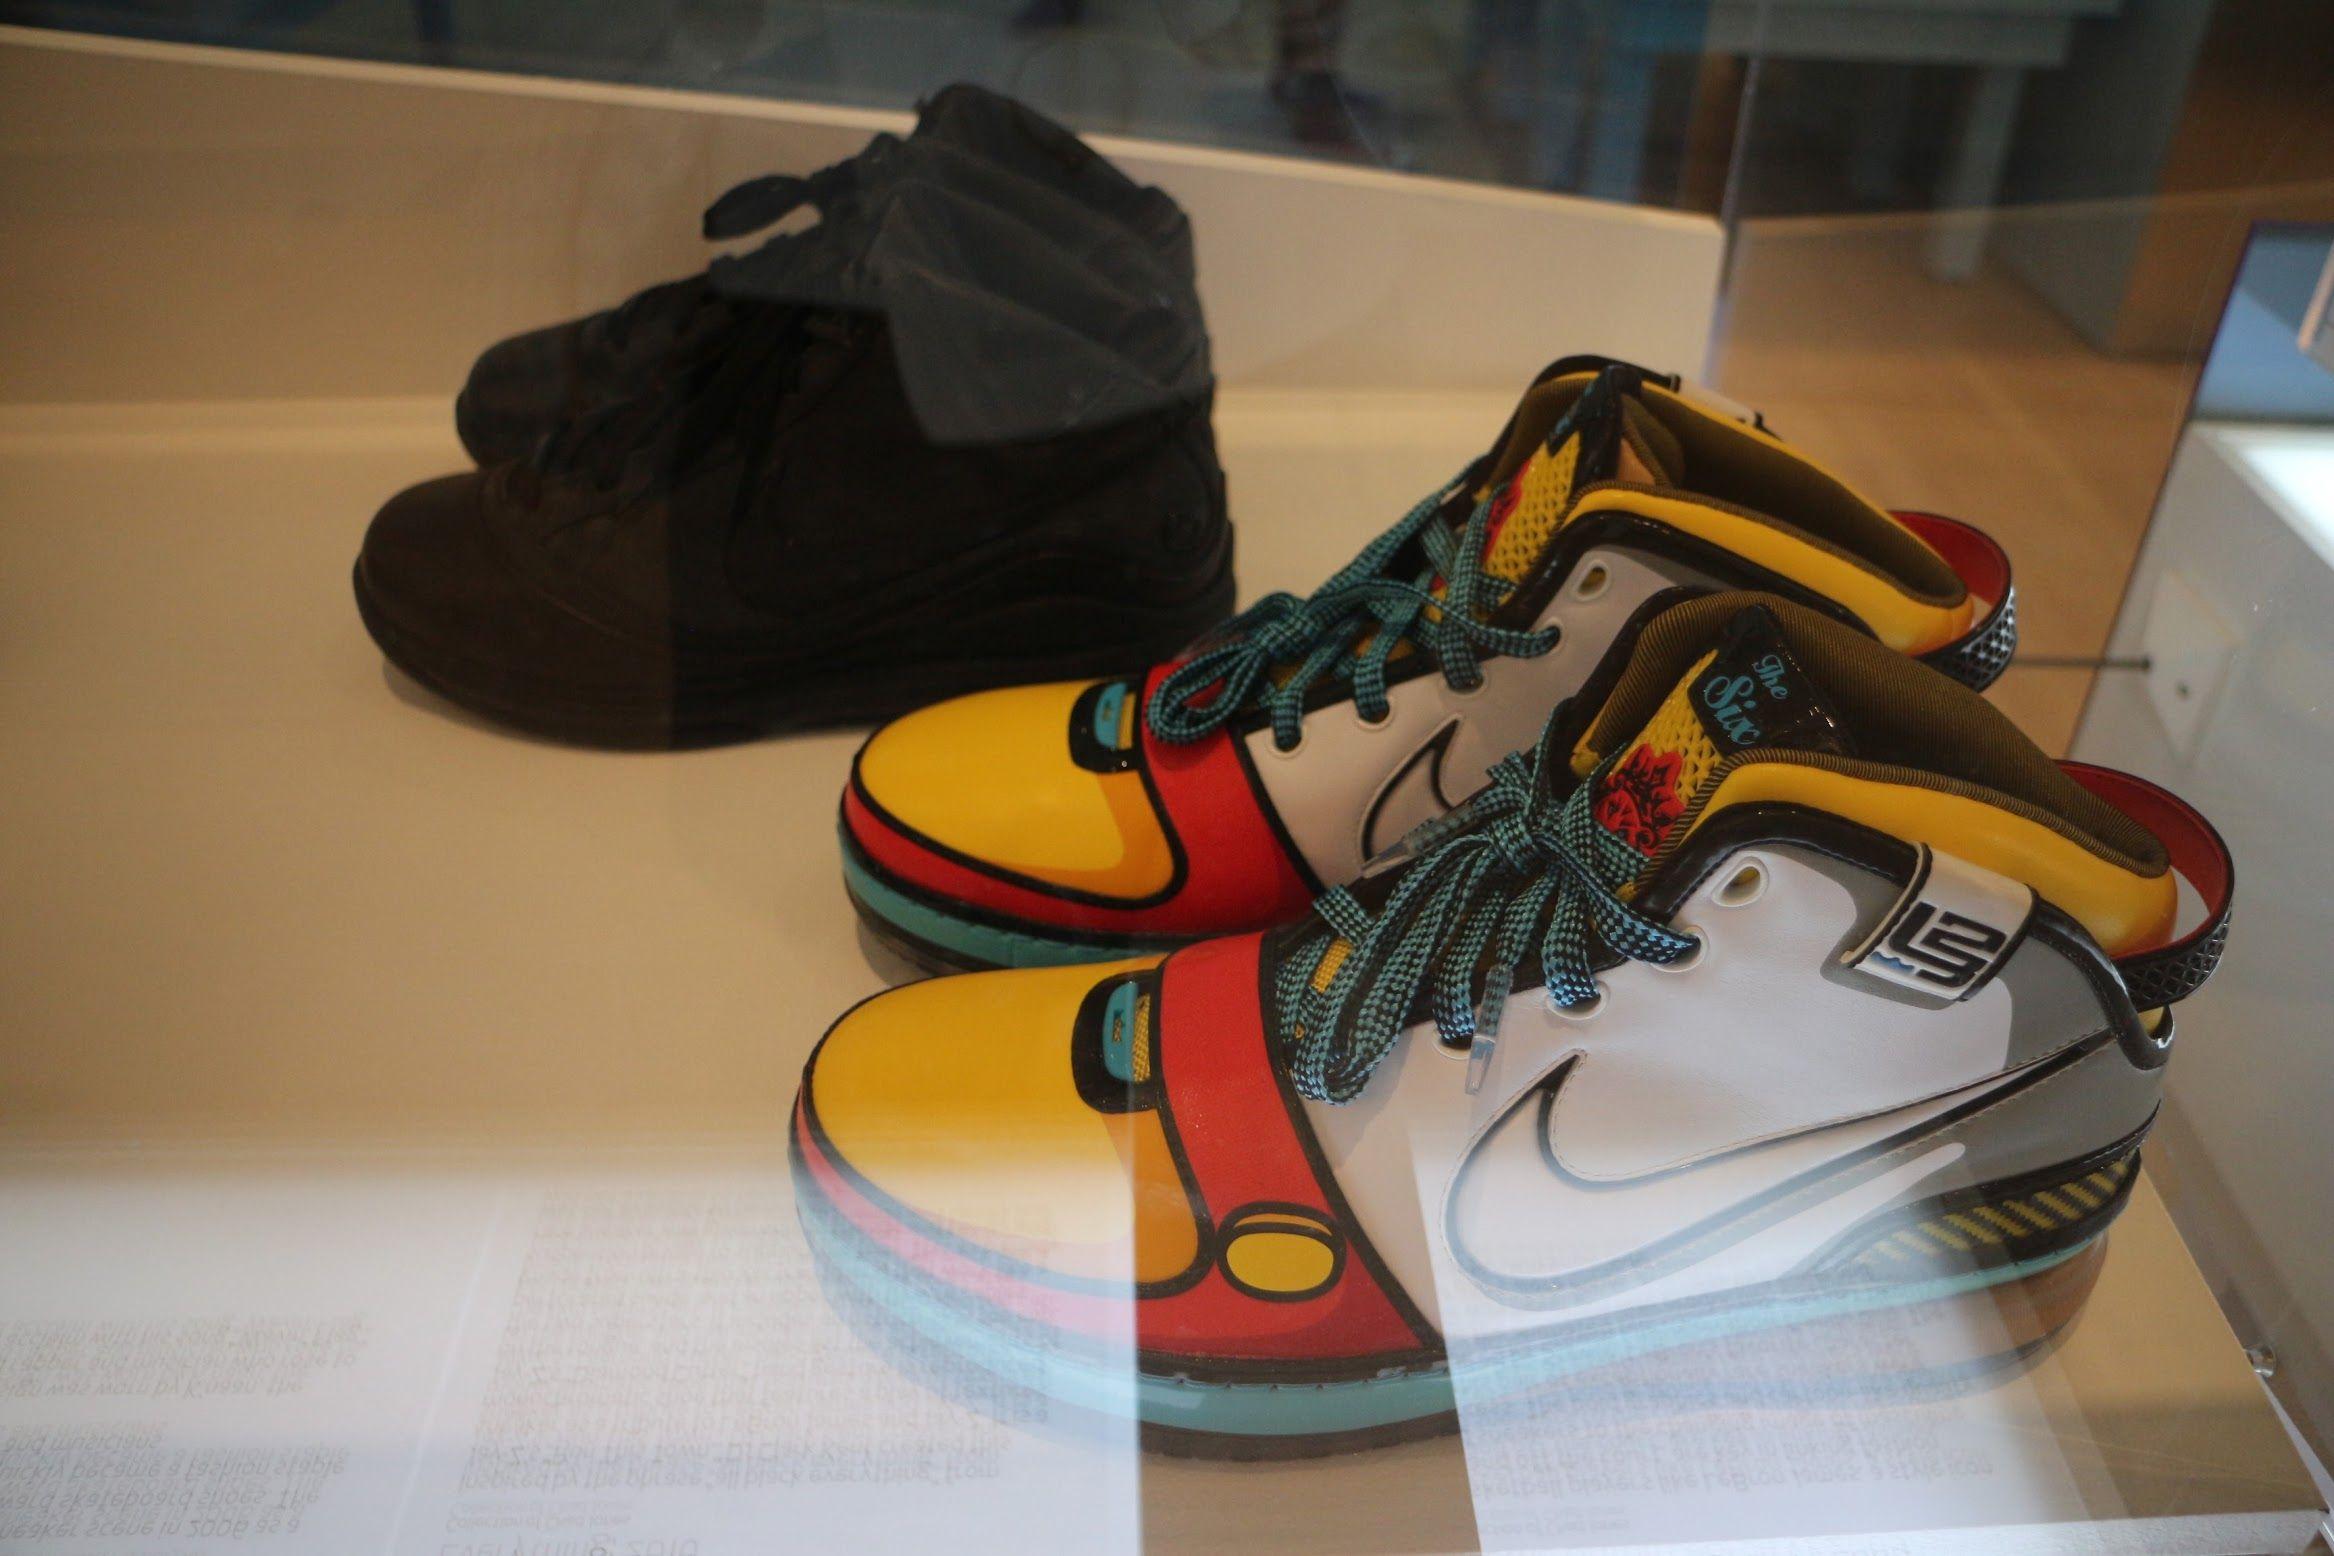 e3351bd3d04bc Nike Stewie Griffin LeBron VI